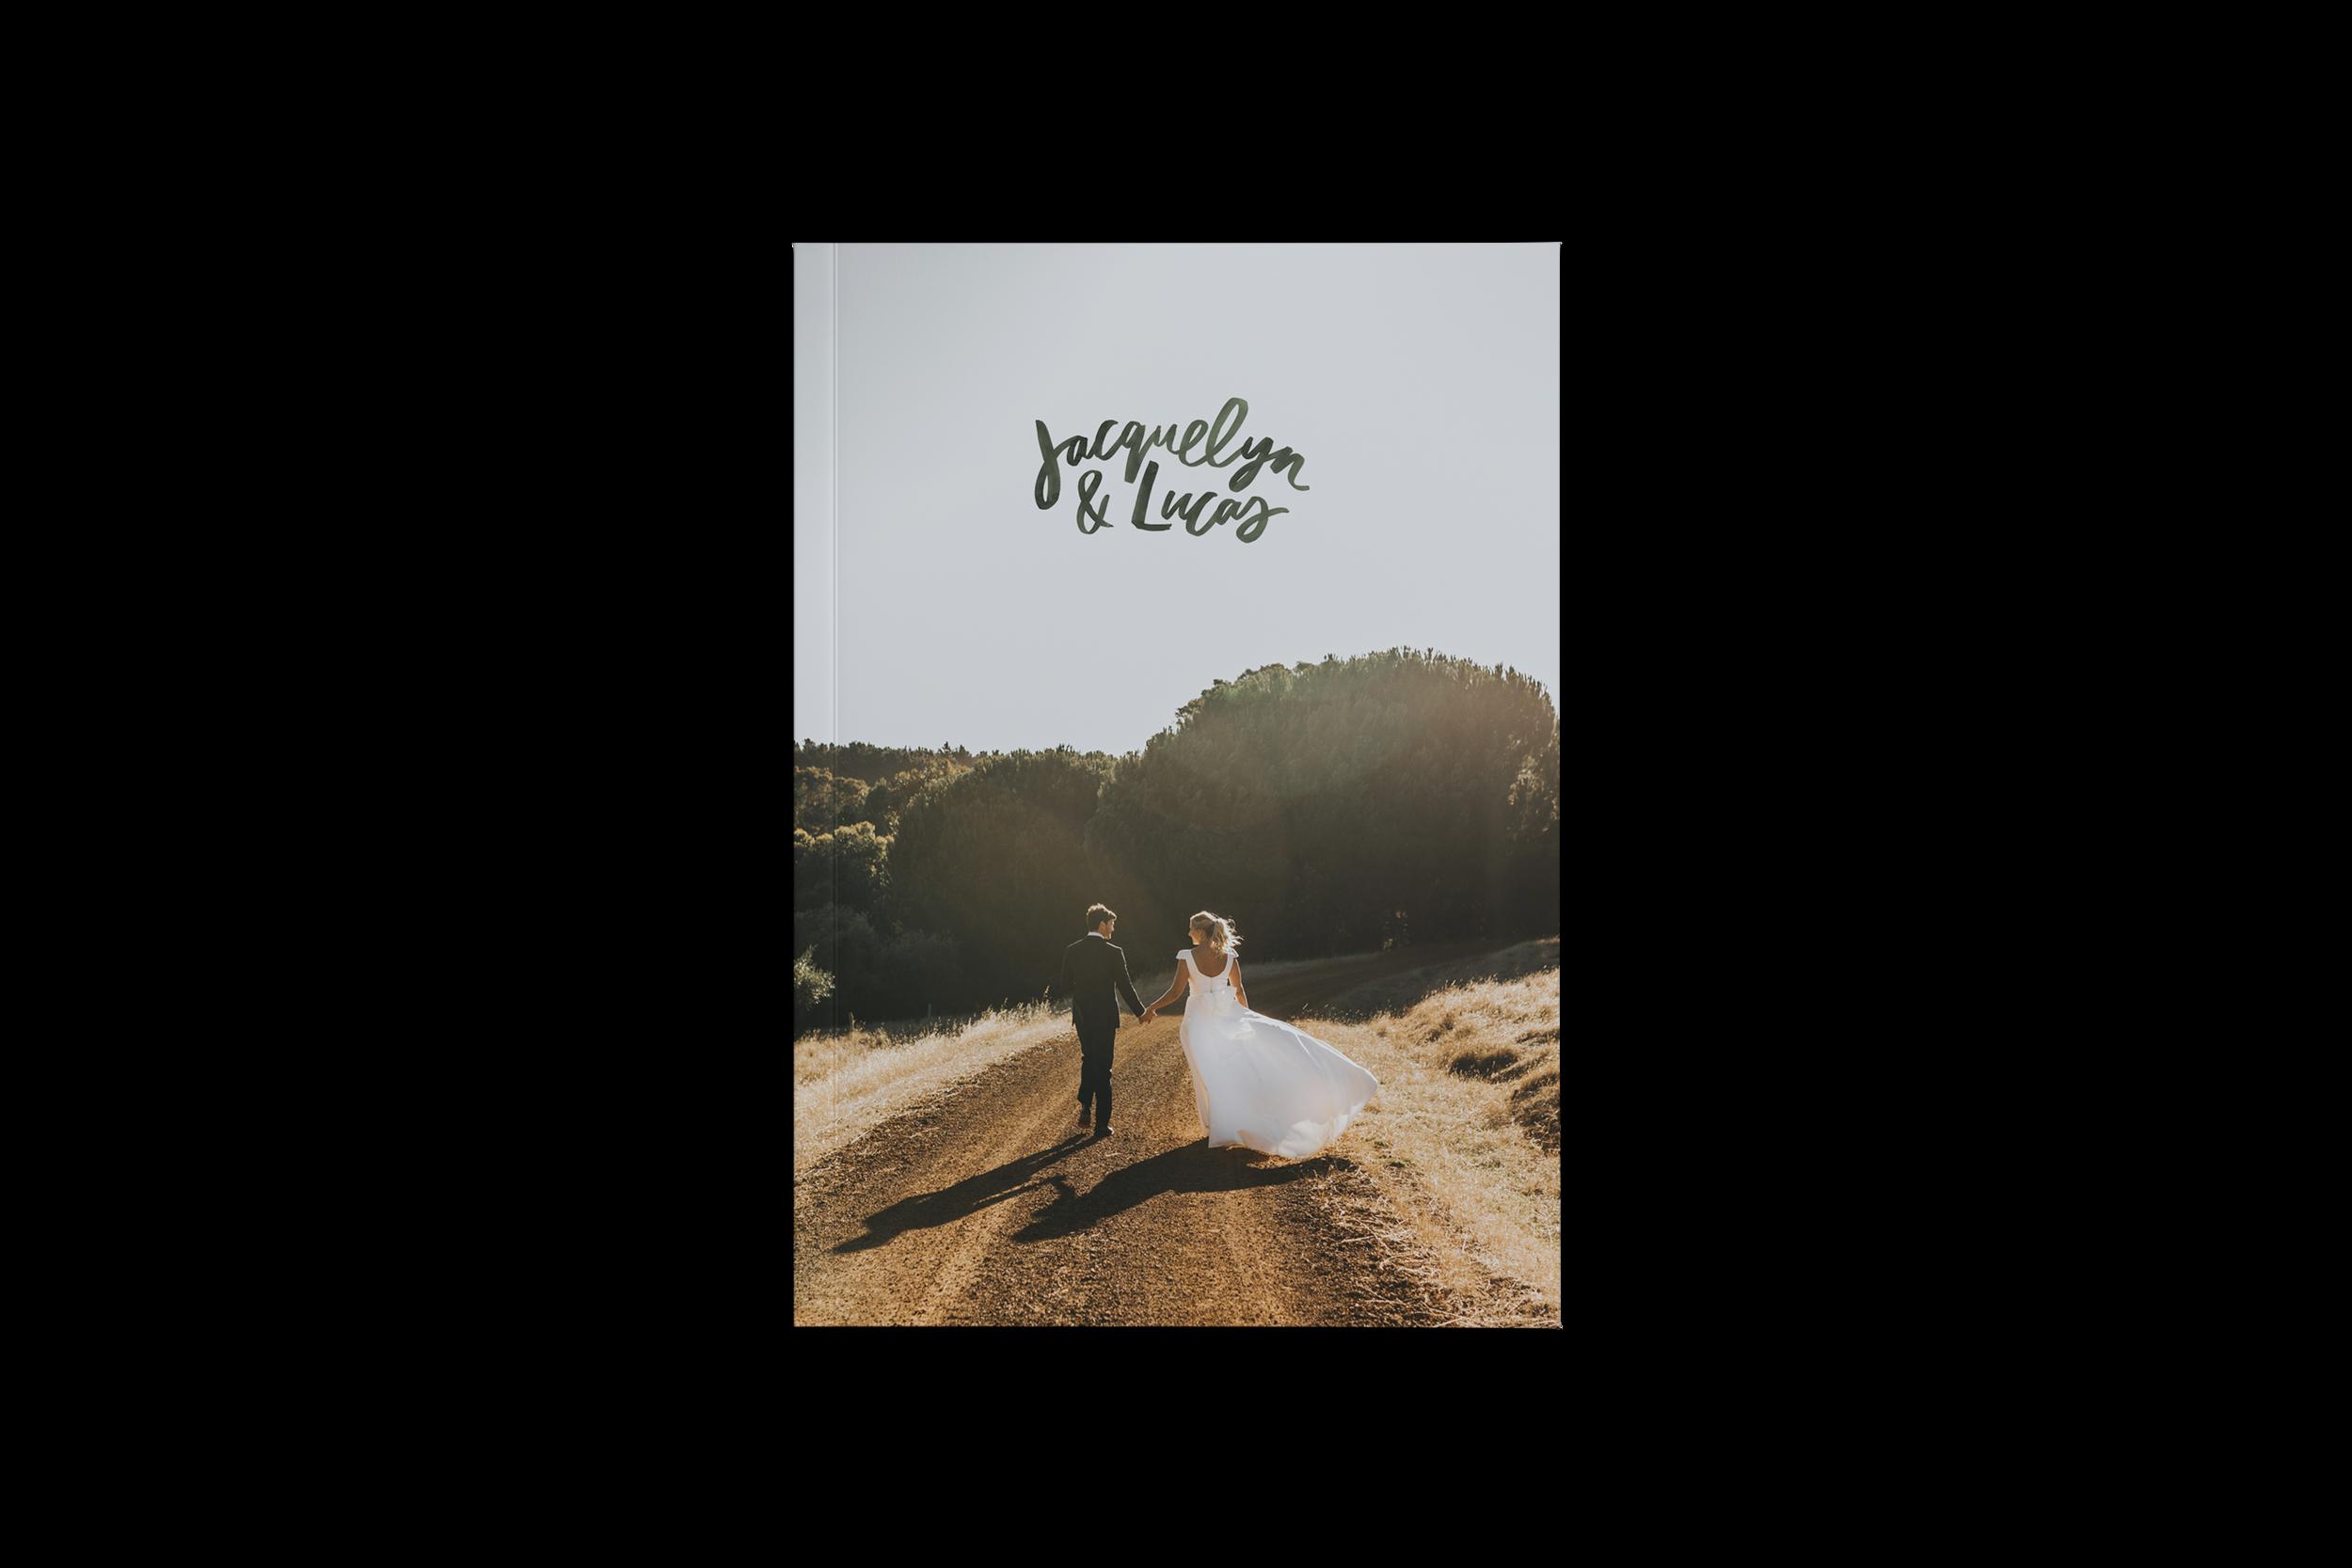 Jacq-Lucas-Wedding-Zine-Cover.png